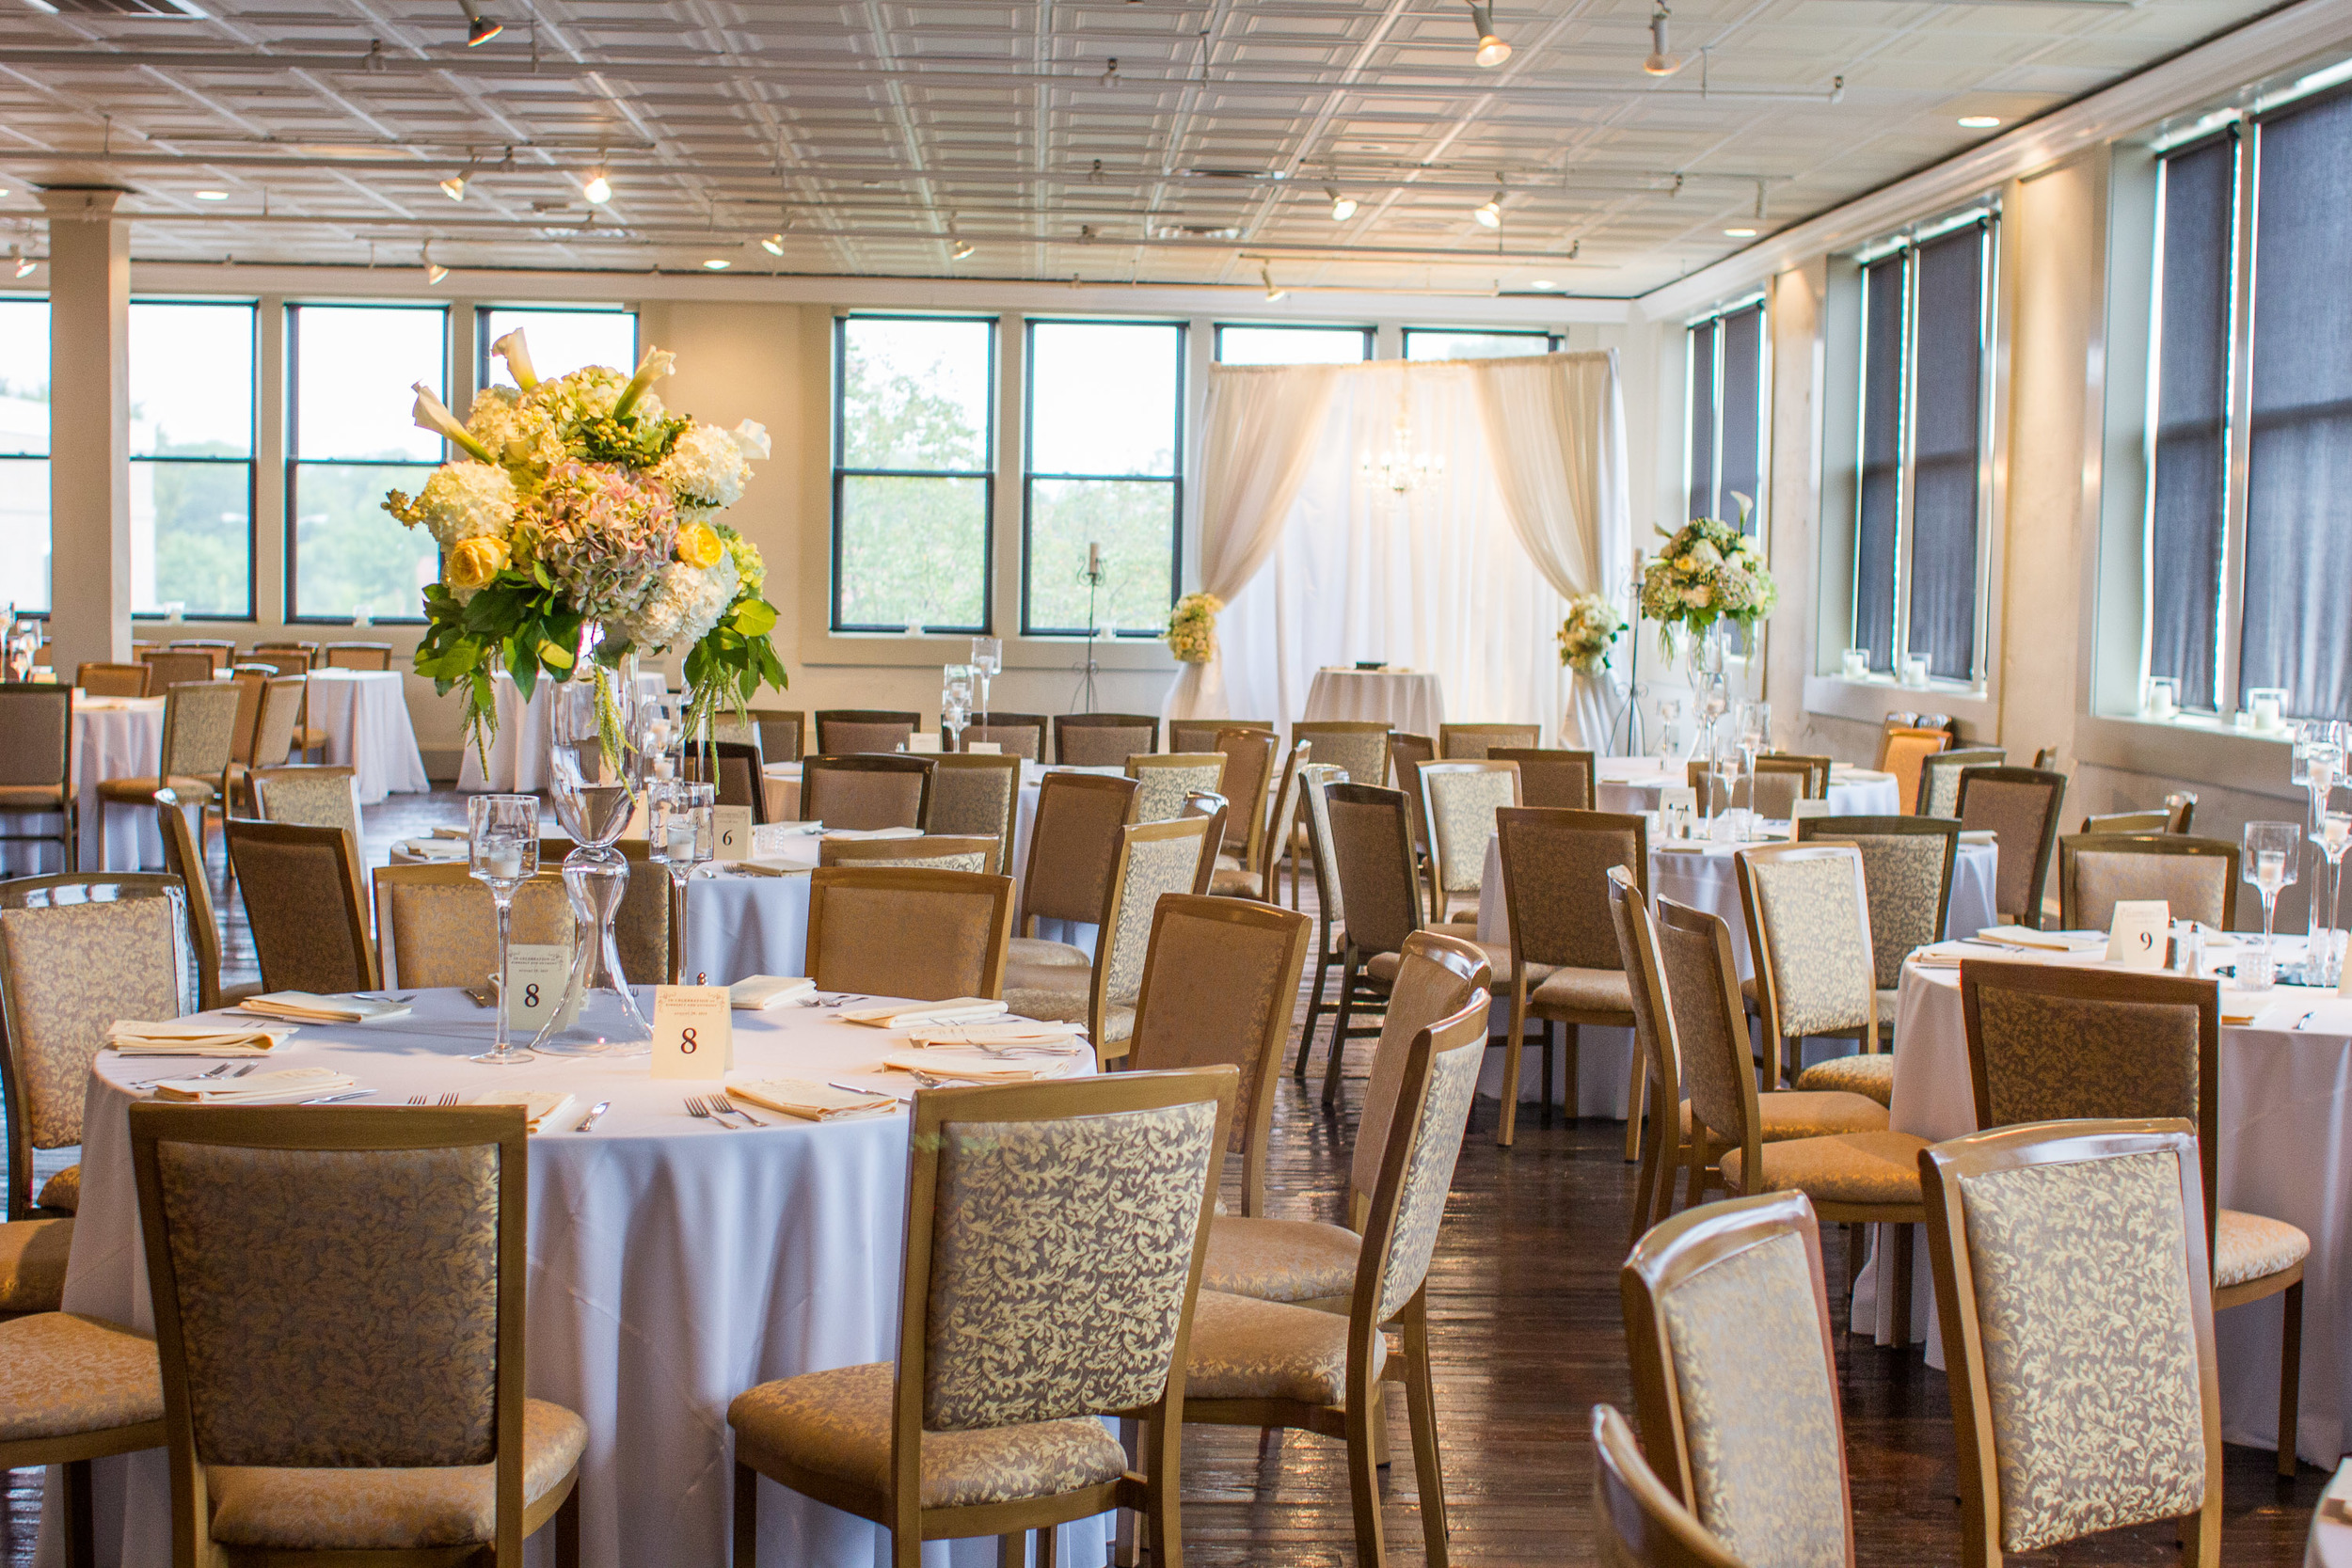 martinsborough greenville nc wedding venue